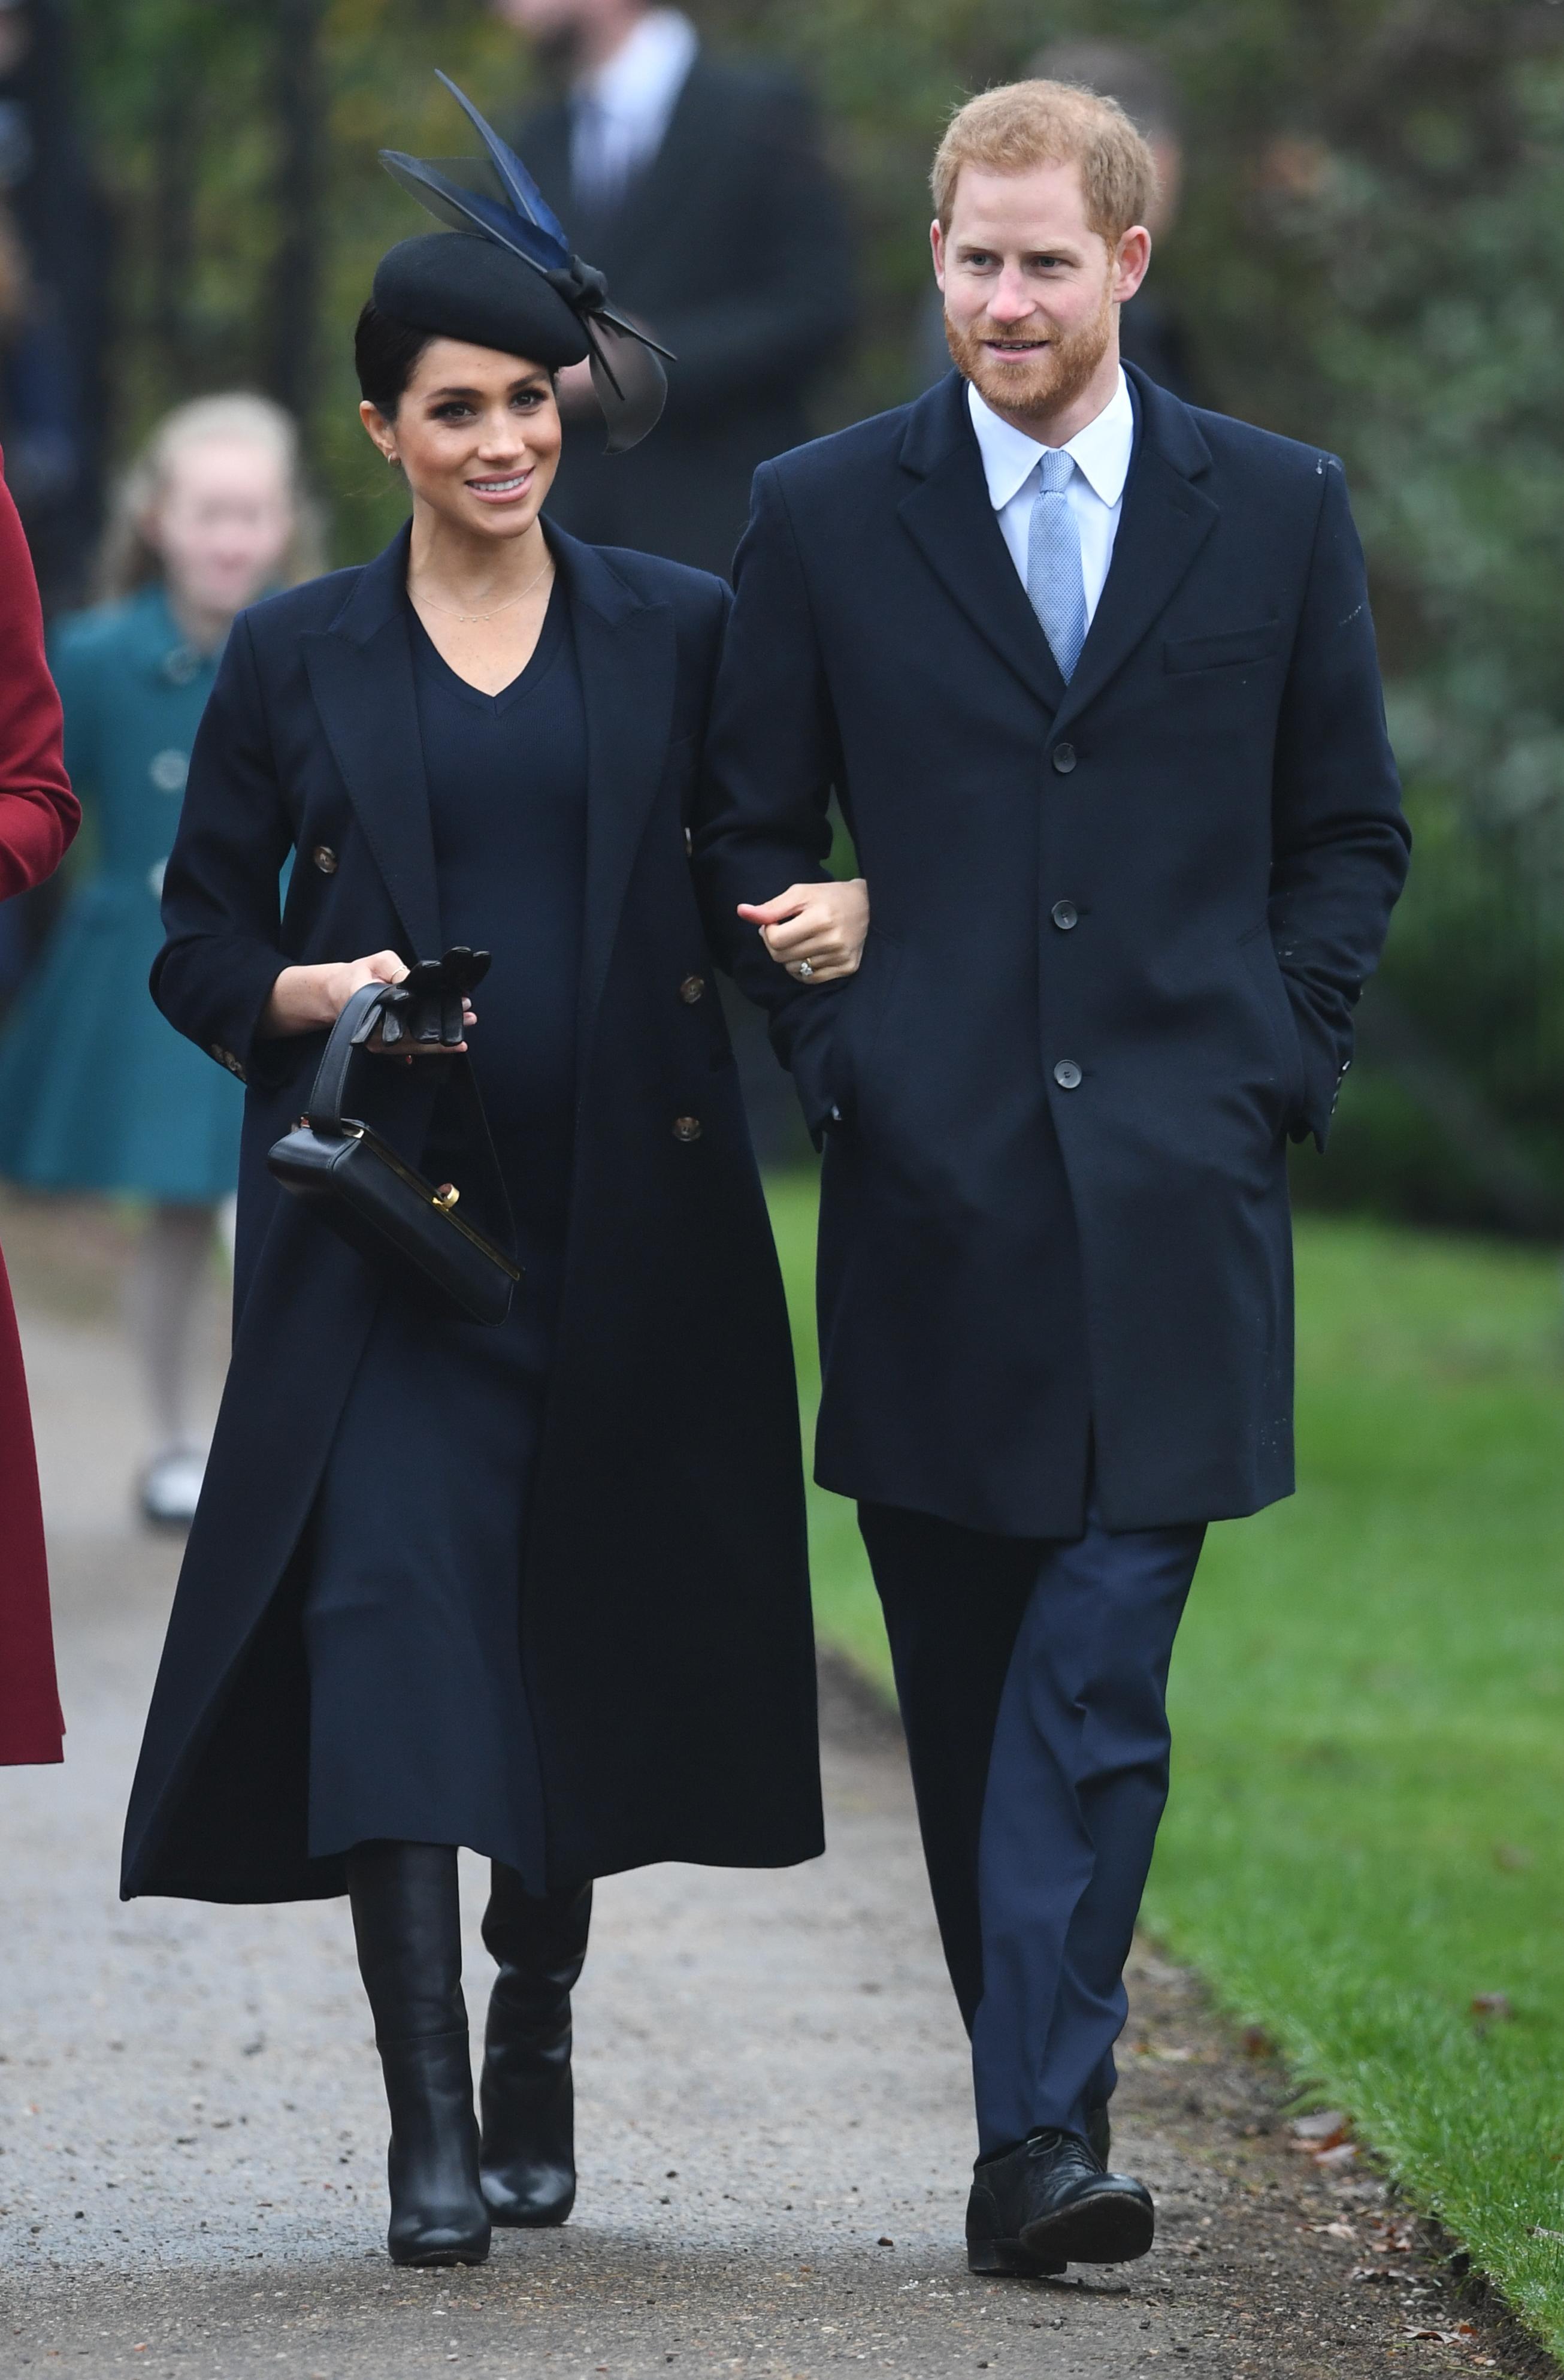 Meghan Markle Christmas.Meghan Markle Kate Middleton Are All Smiles At Christmas